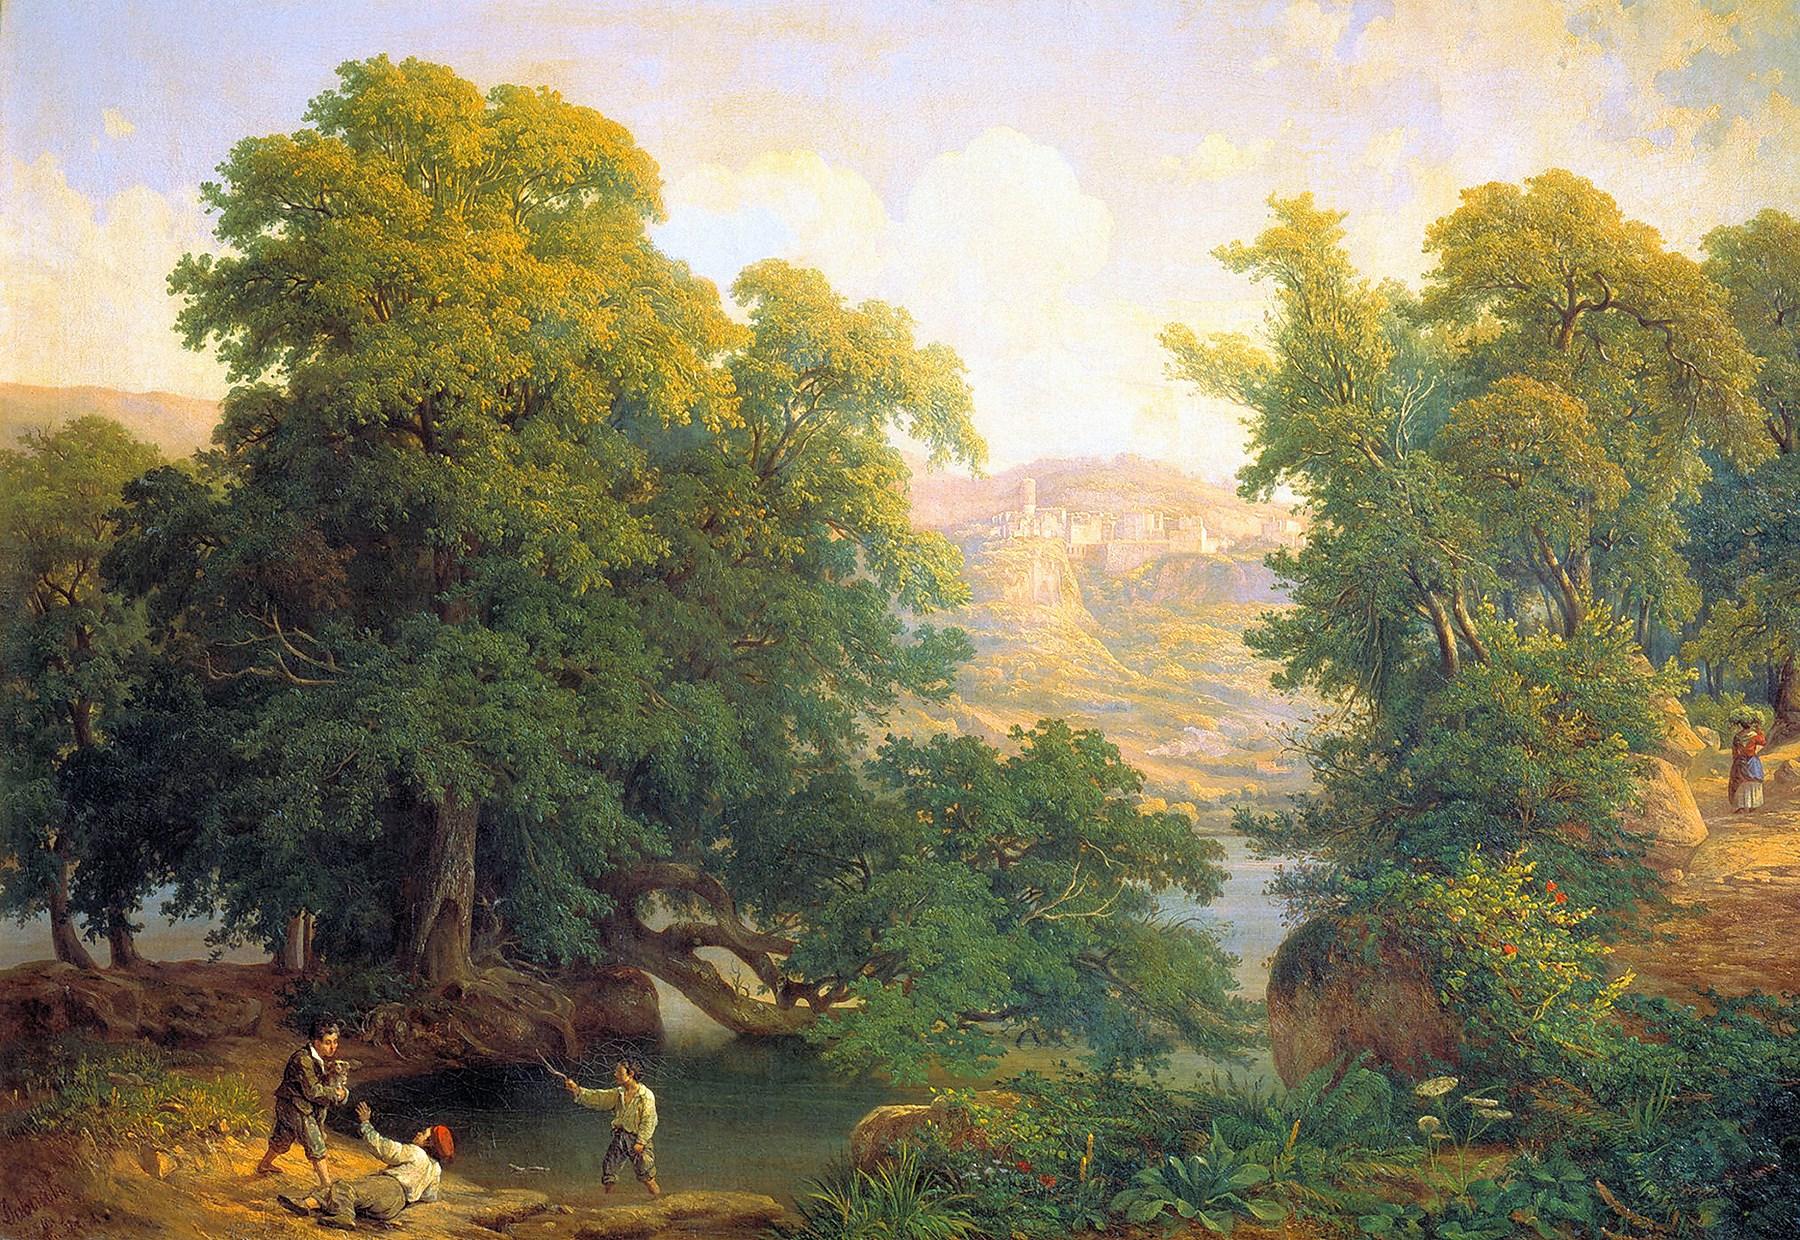 00 Ivan Daydov. In the Roman Suburbs. 1856